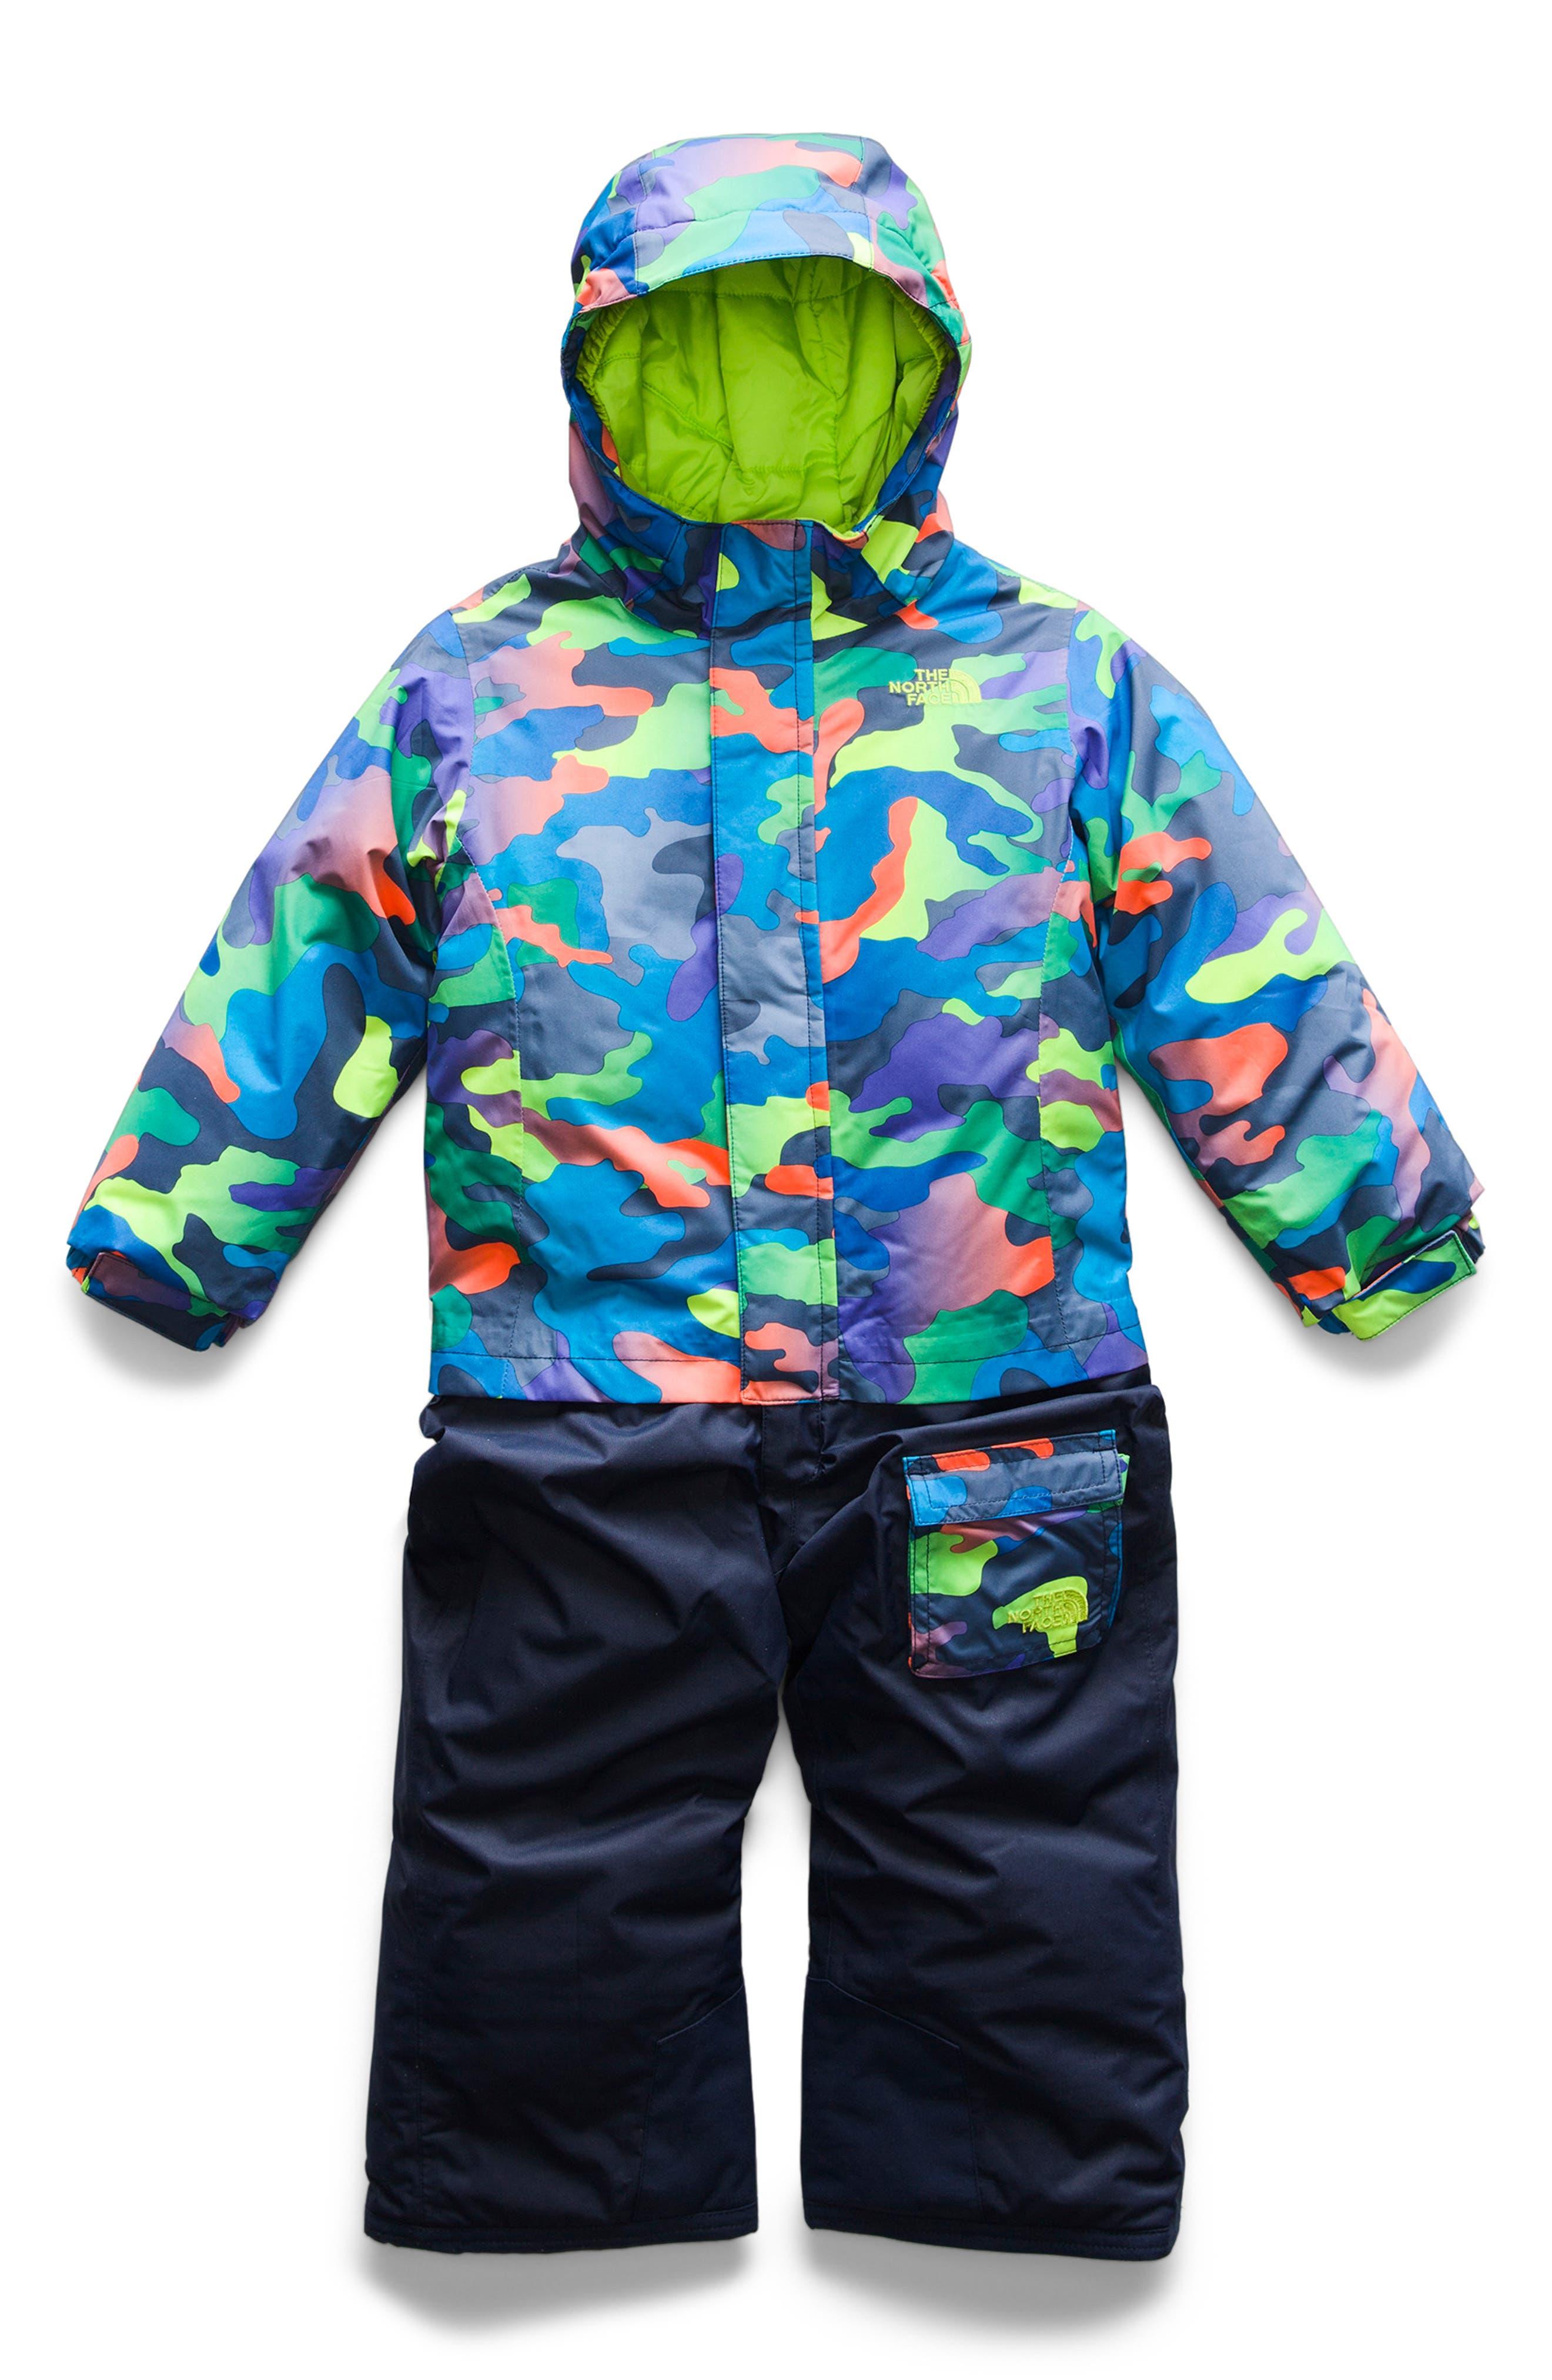 Heatseeker<sup>™</sup> Insulated Waterproof & Windproof Snowsuit,                             Main thumbnail 1, color,                             400